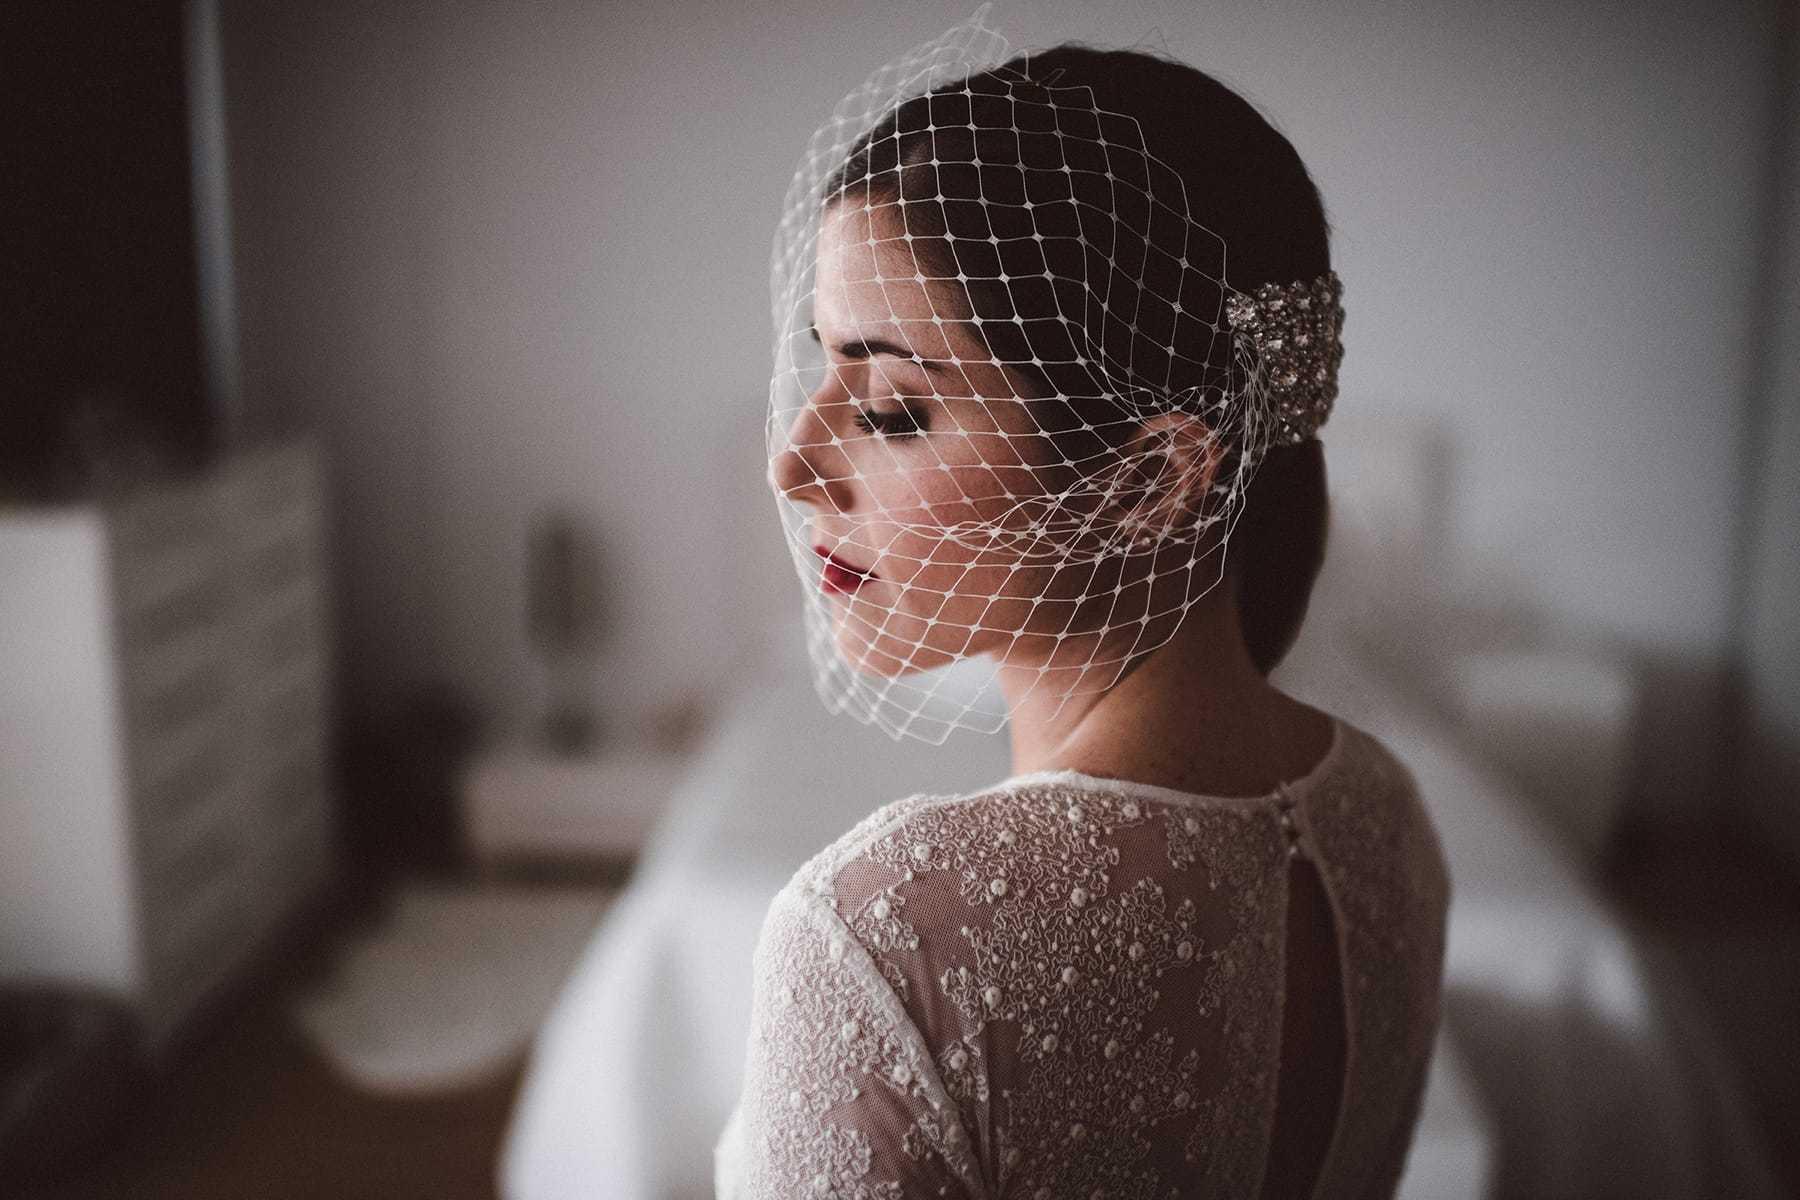 vestido_de_novia_otaduy_hilario_sanchez_fotografo_boda_barcelona_040